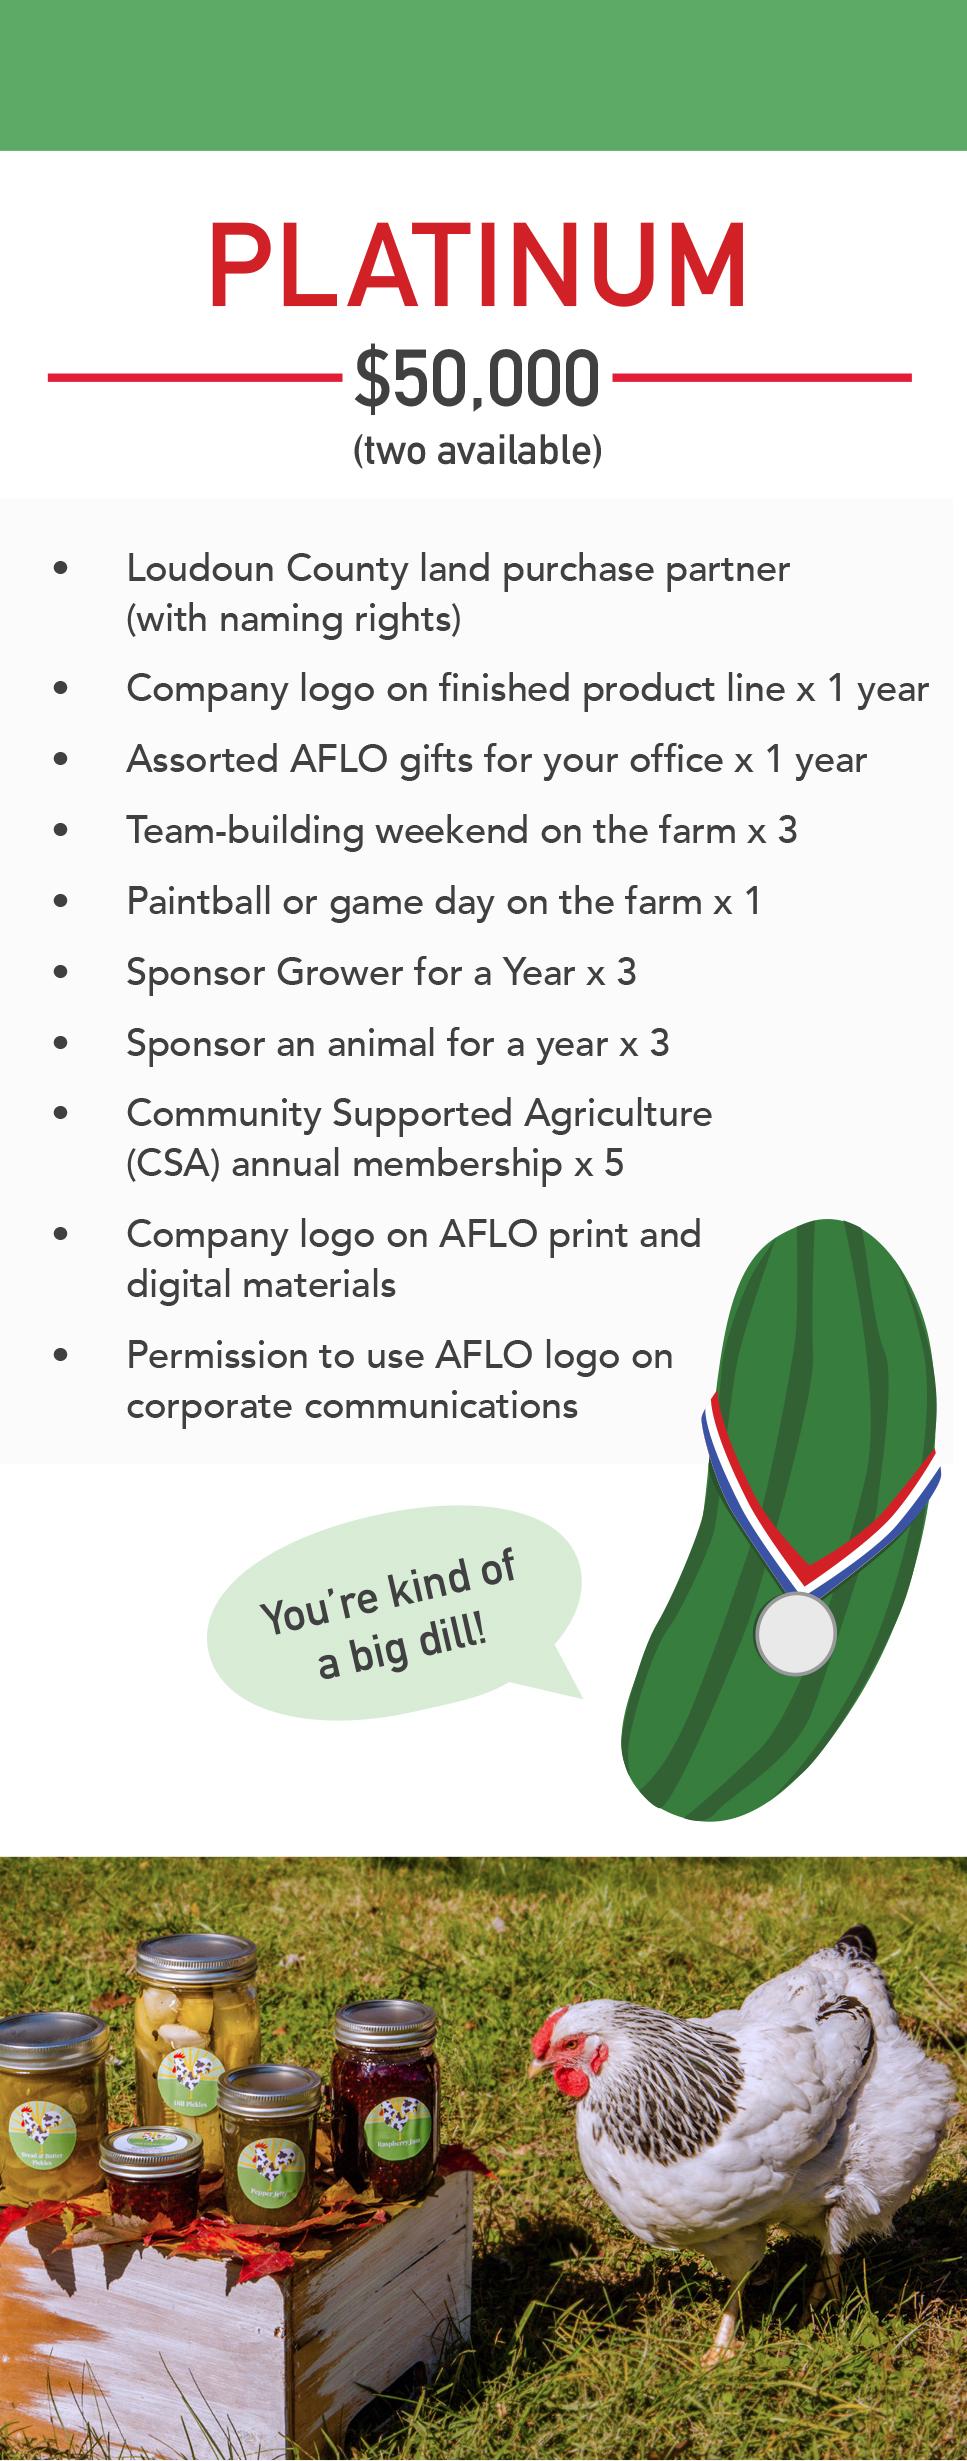 20190410_AFLO Brochure Platinum.jpg